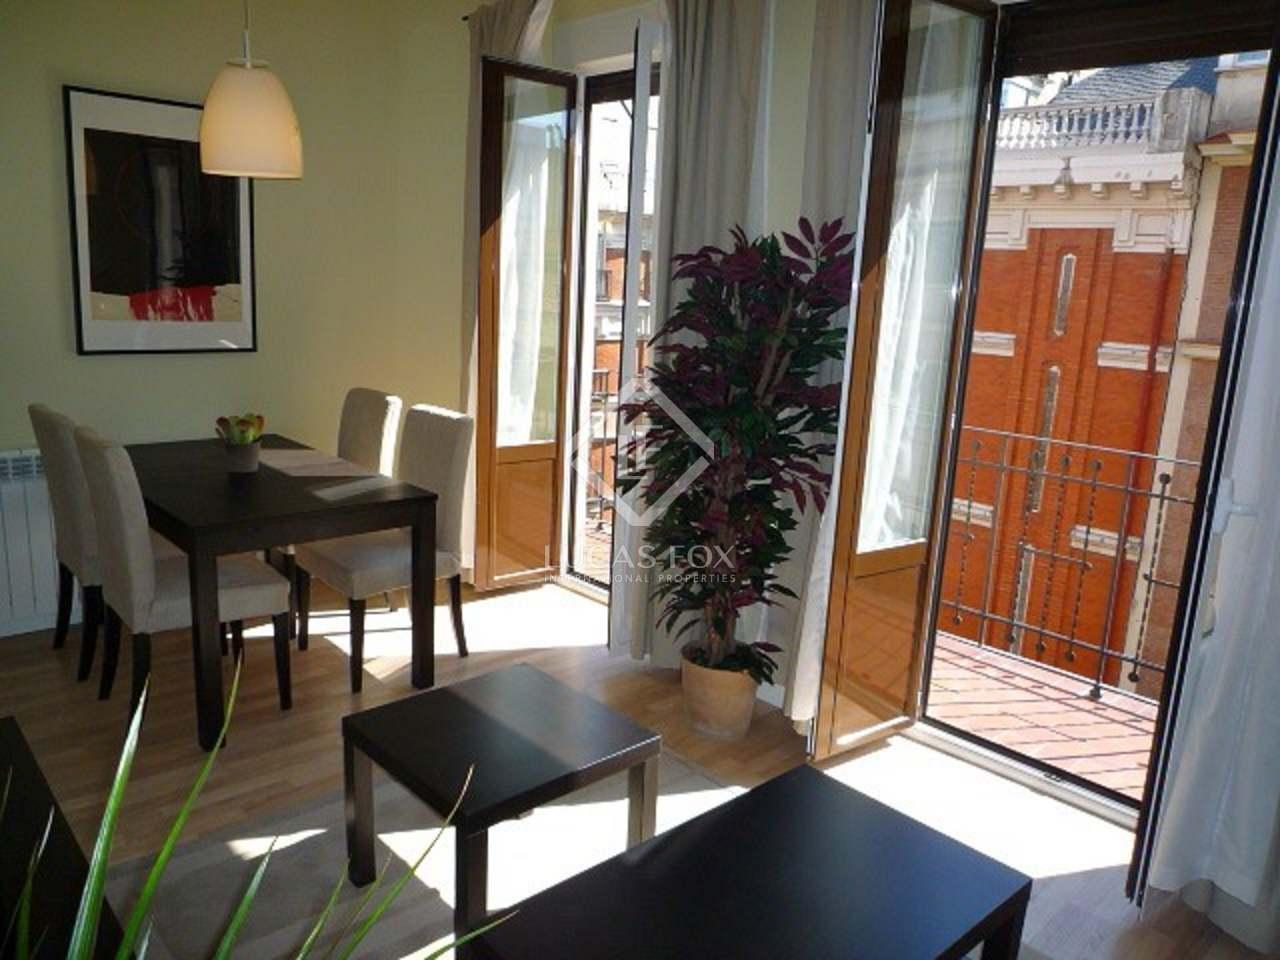 83m wohnung zur miete in almagro madrid. Black Bedroom Furniture Sets. Home Design Ideas